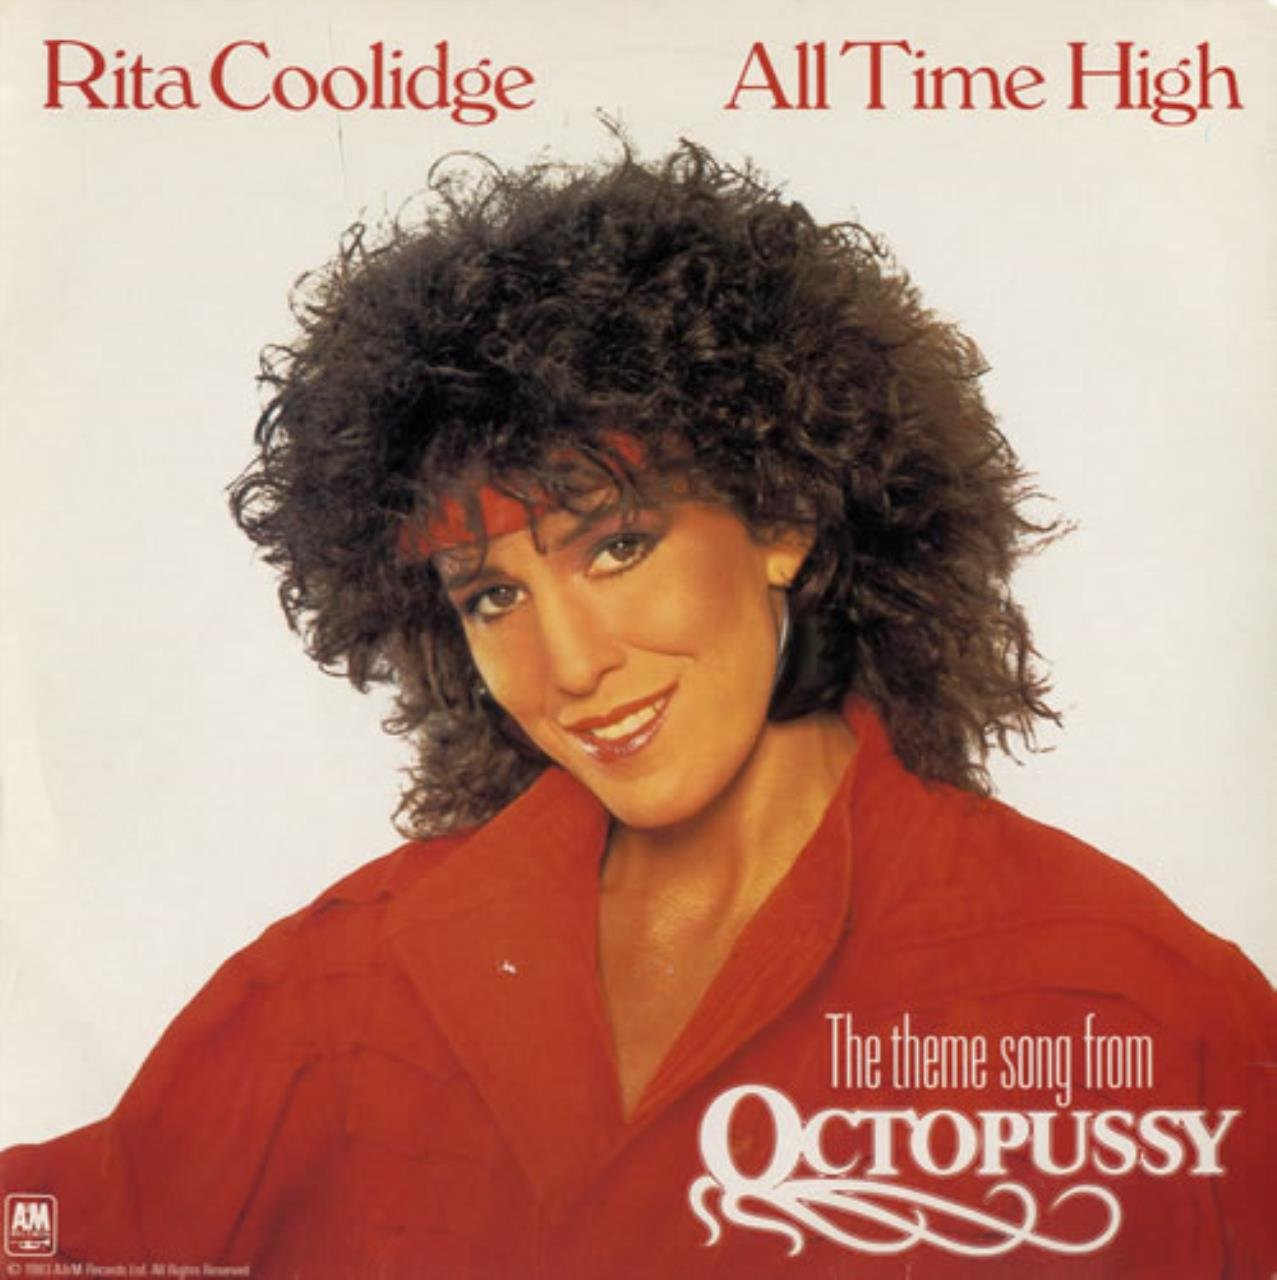 All Time High: Rita Coolidge: Amazon.fr: Musique